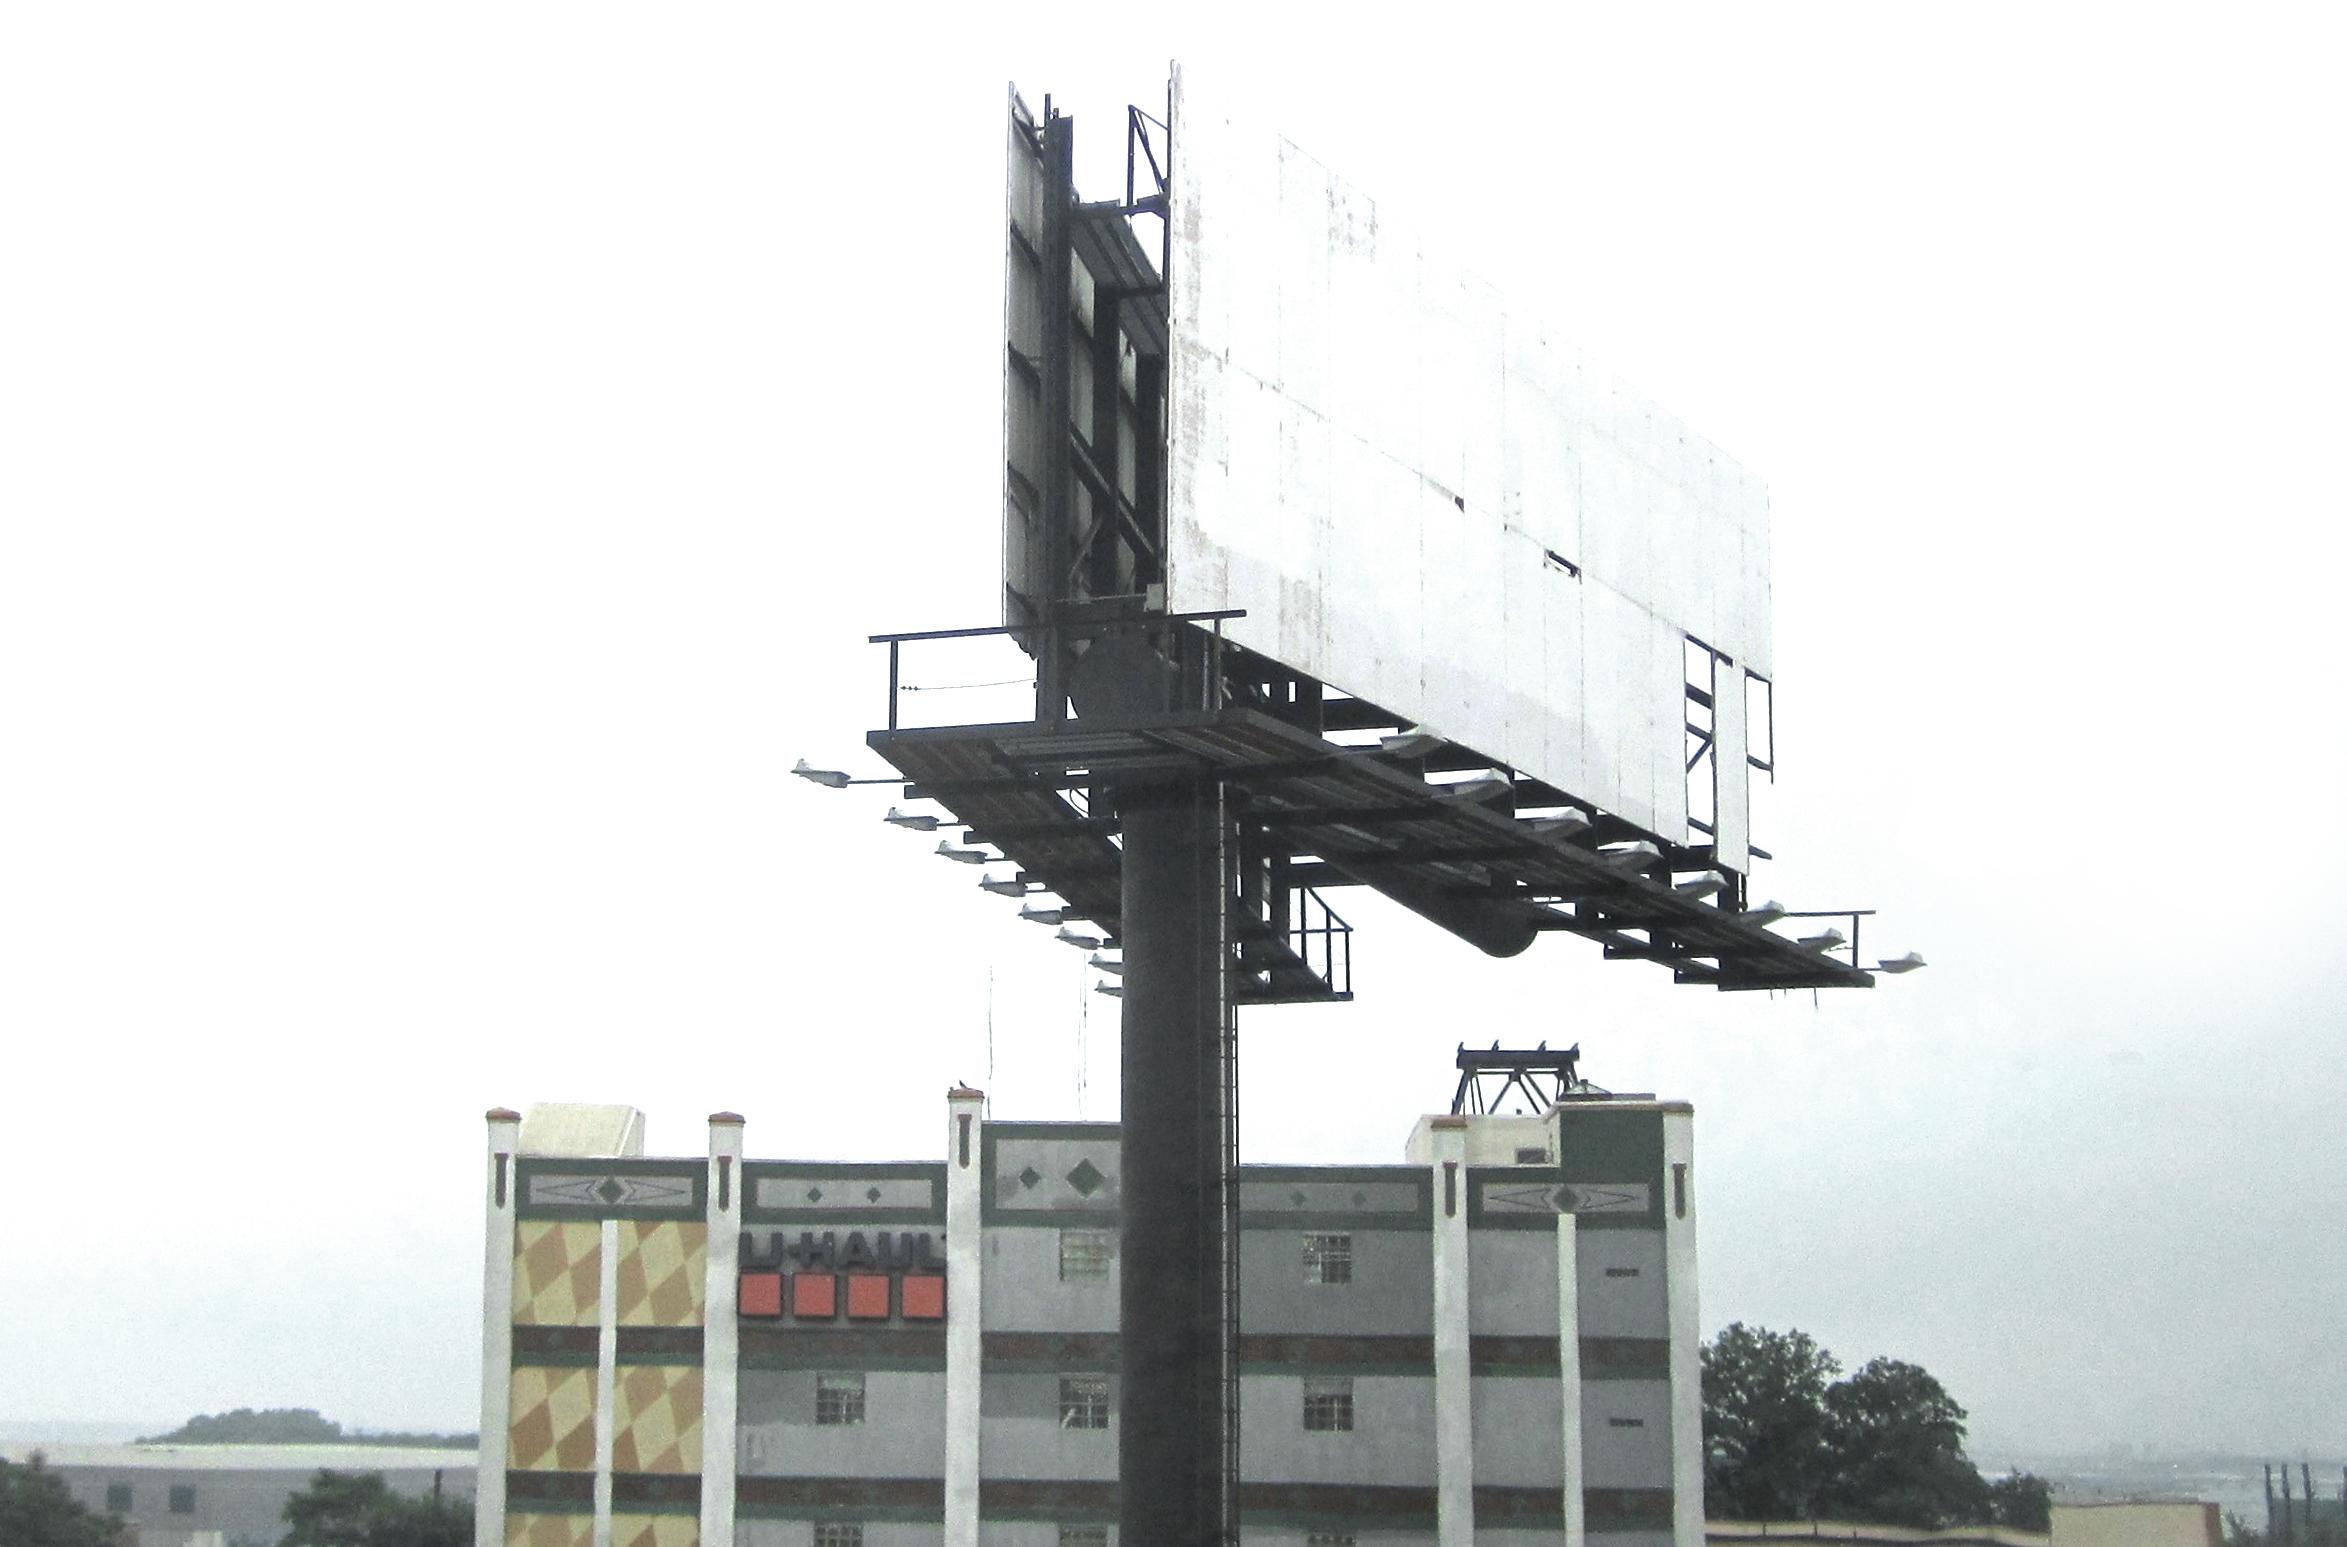 Edgeless Billboard